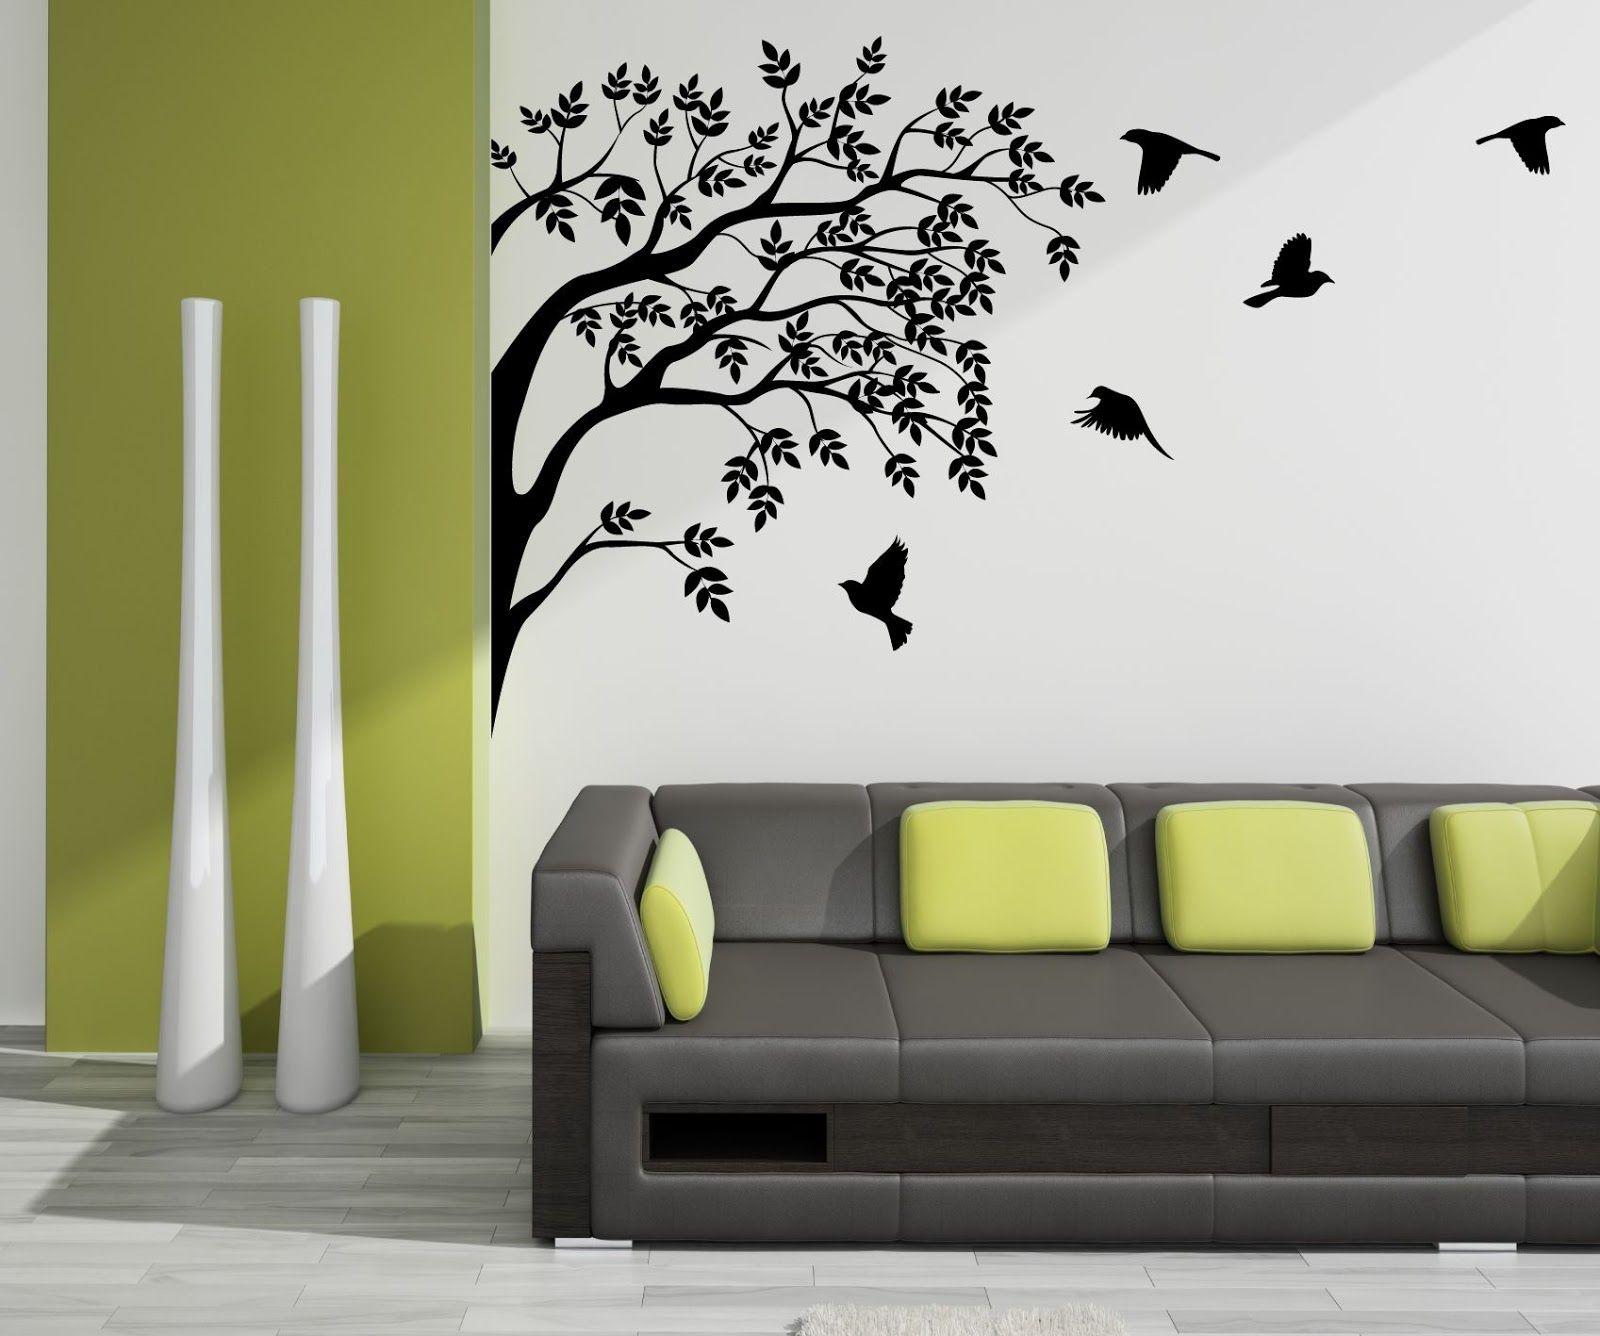 Clever Kids Room Wall Decor Ideas Inspiration Interior Walls